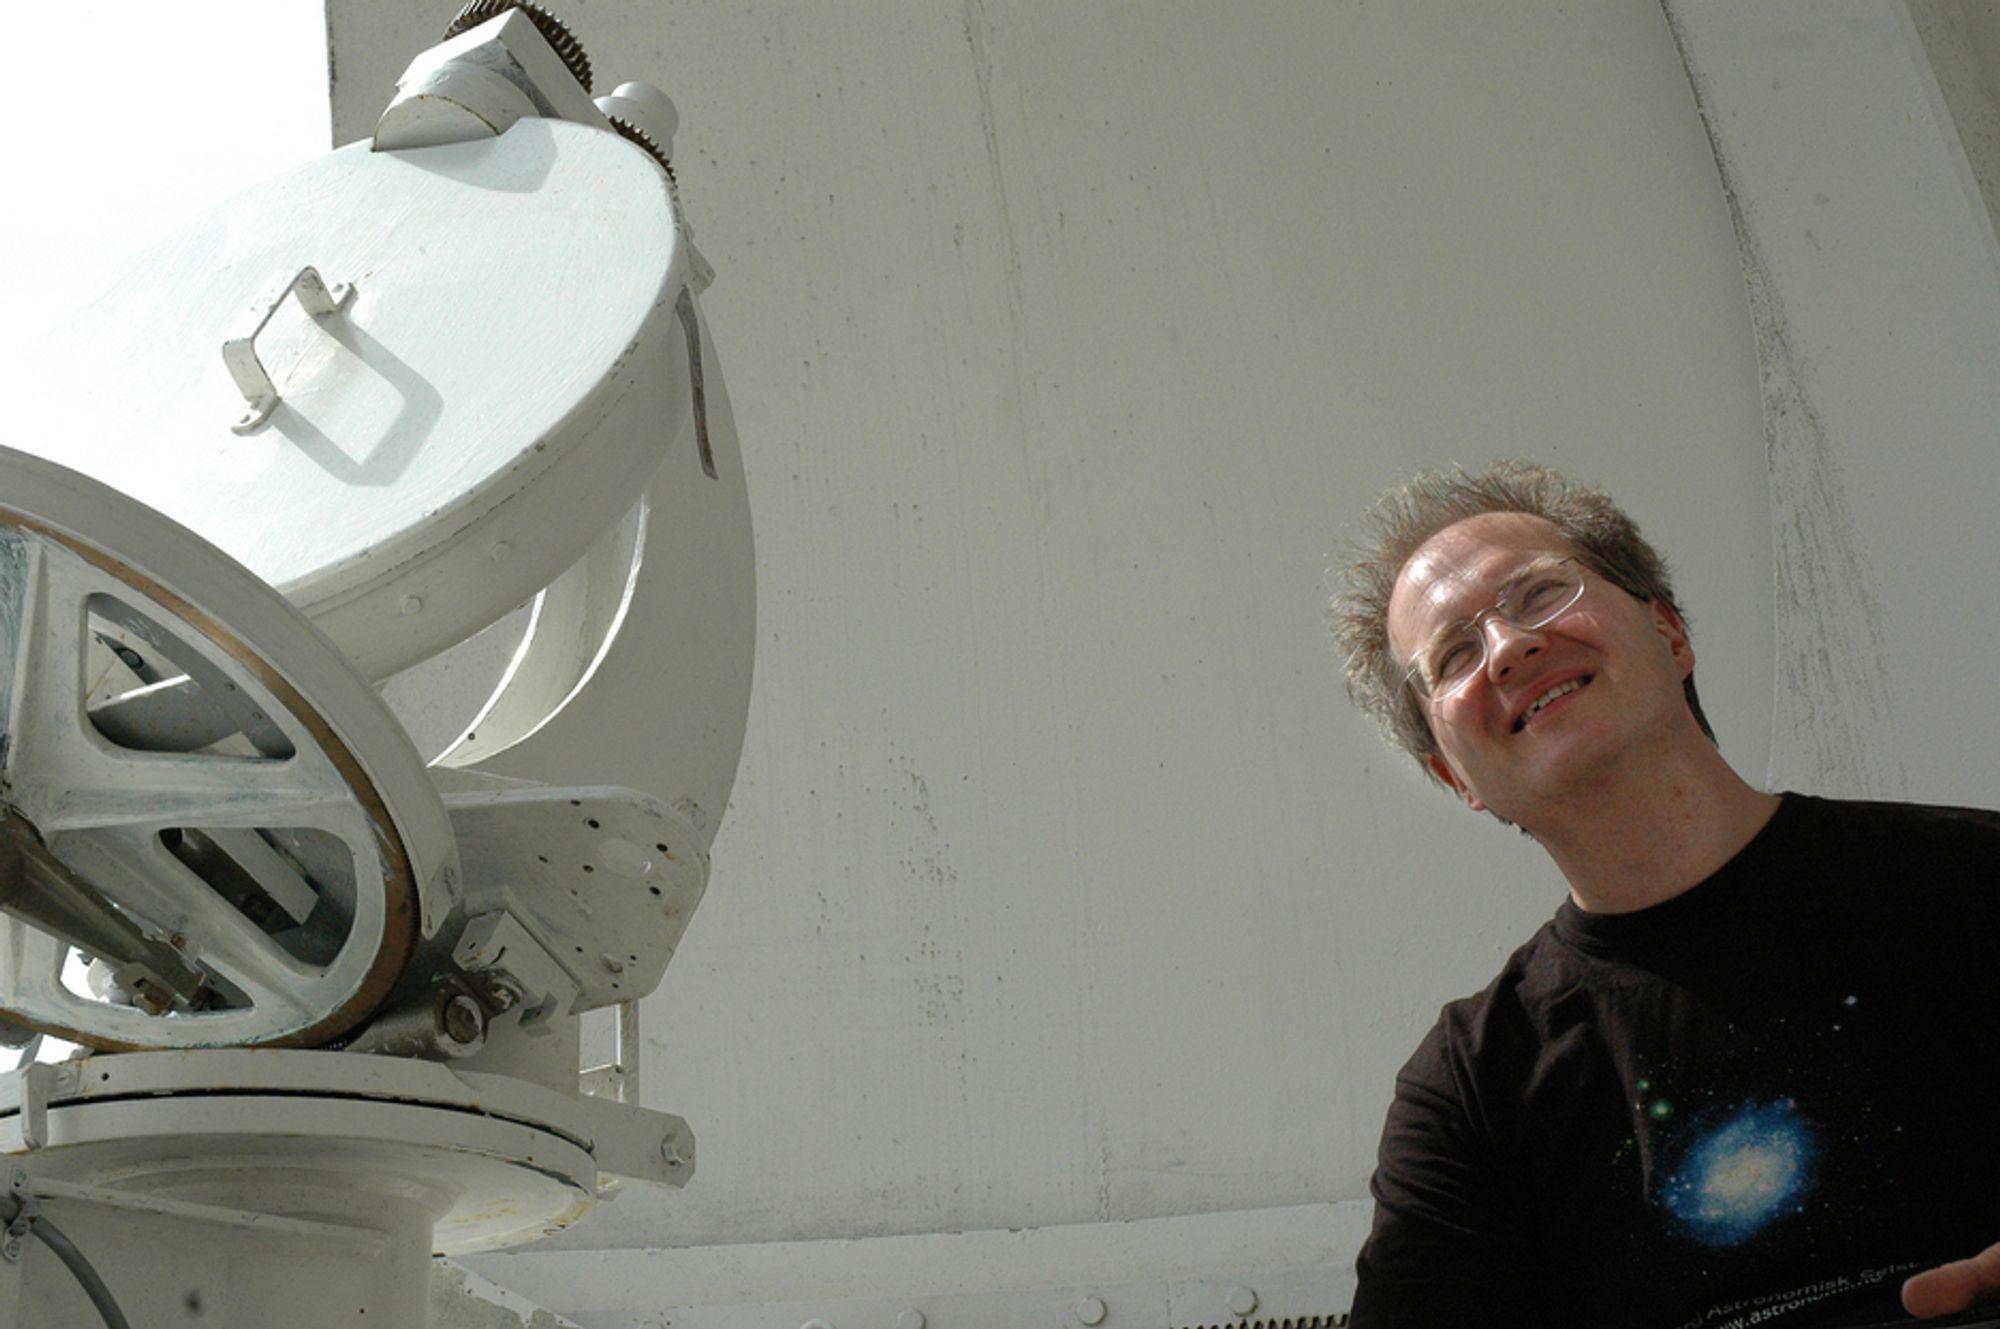 Daglig leder Knut Jørgen Røed Ødegaard ved Solobservatoriet på Harestua er lettet over at det ikke blir nedleggelse. I denne omgang.